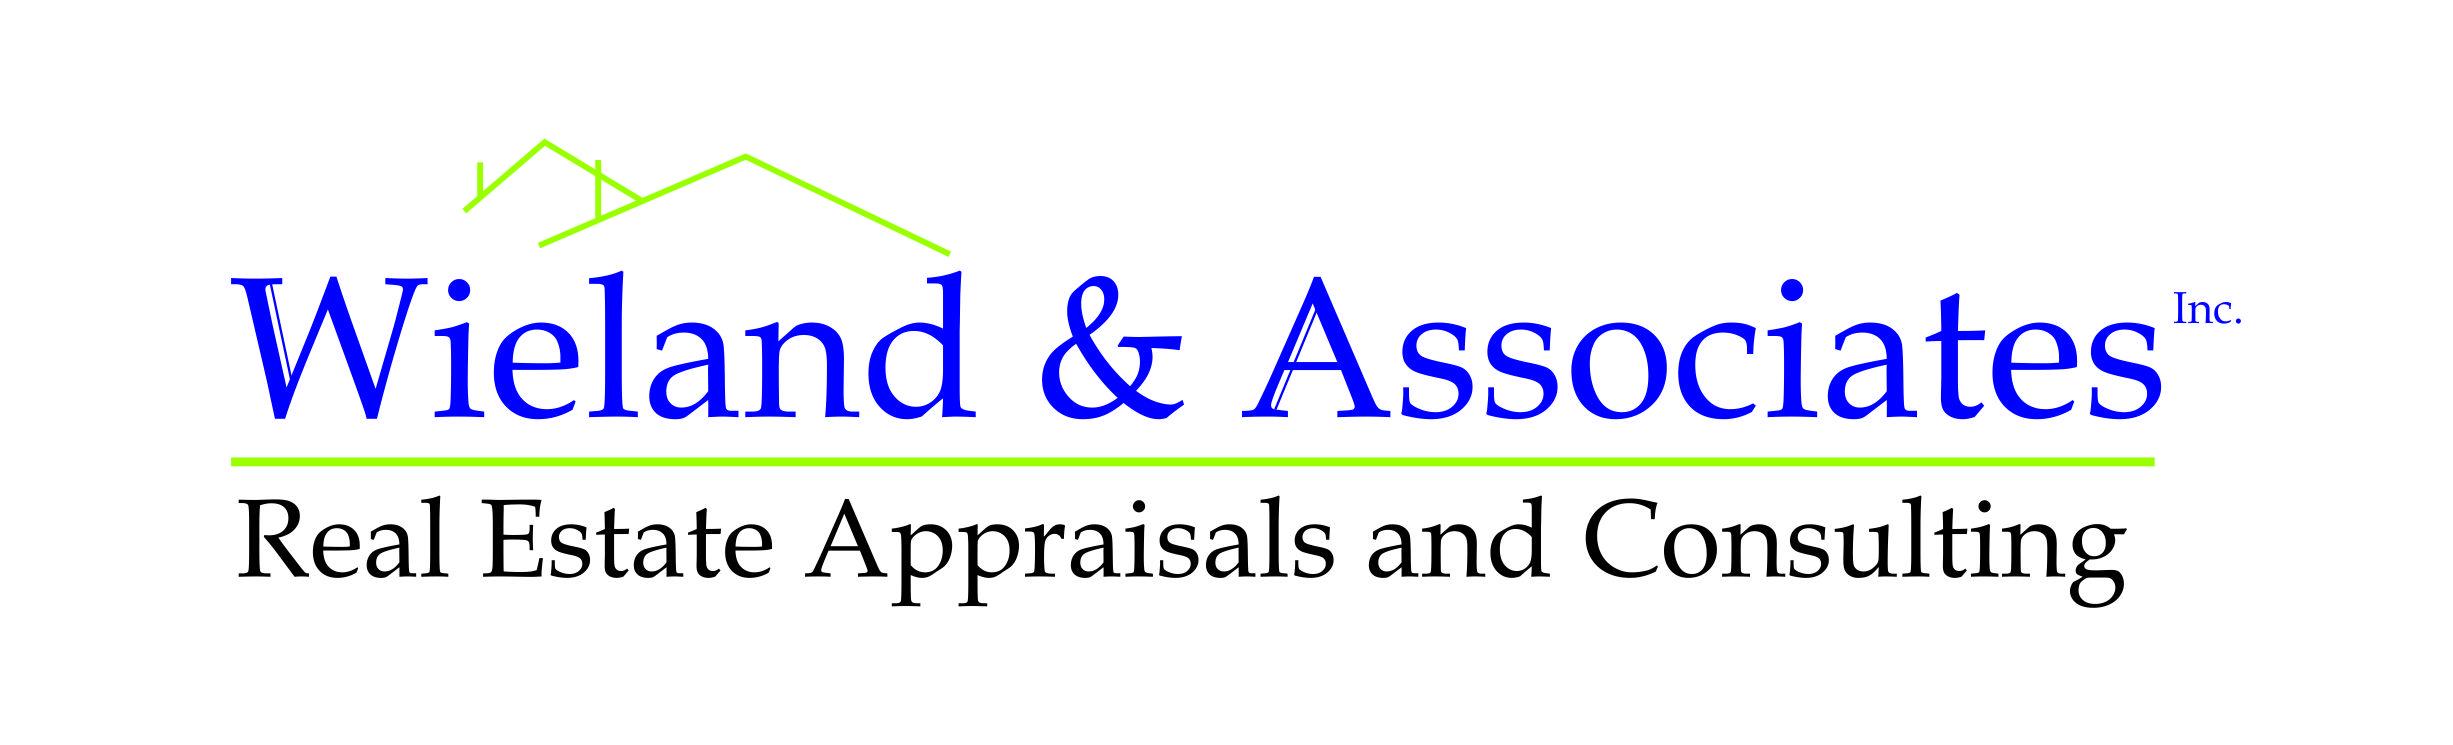 wieland and associates